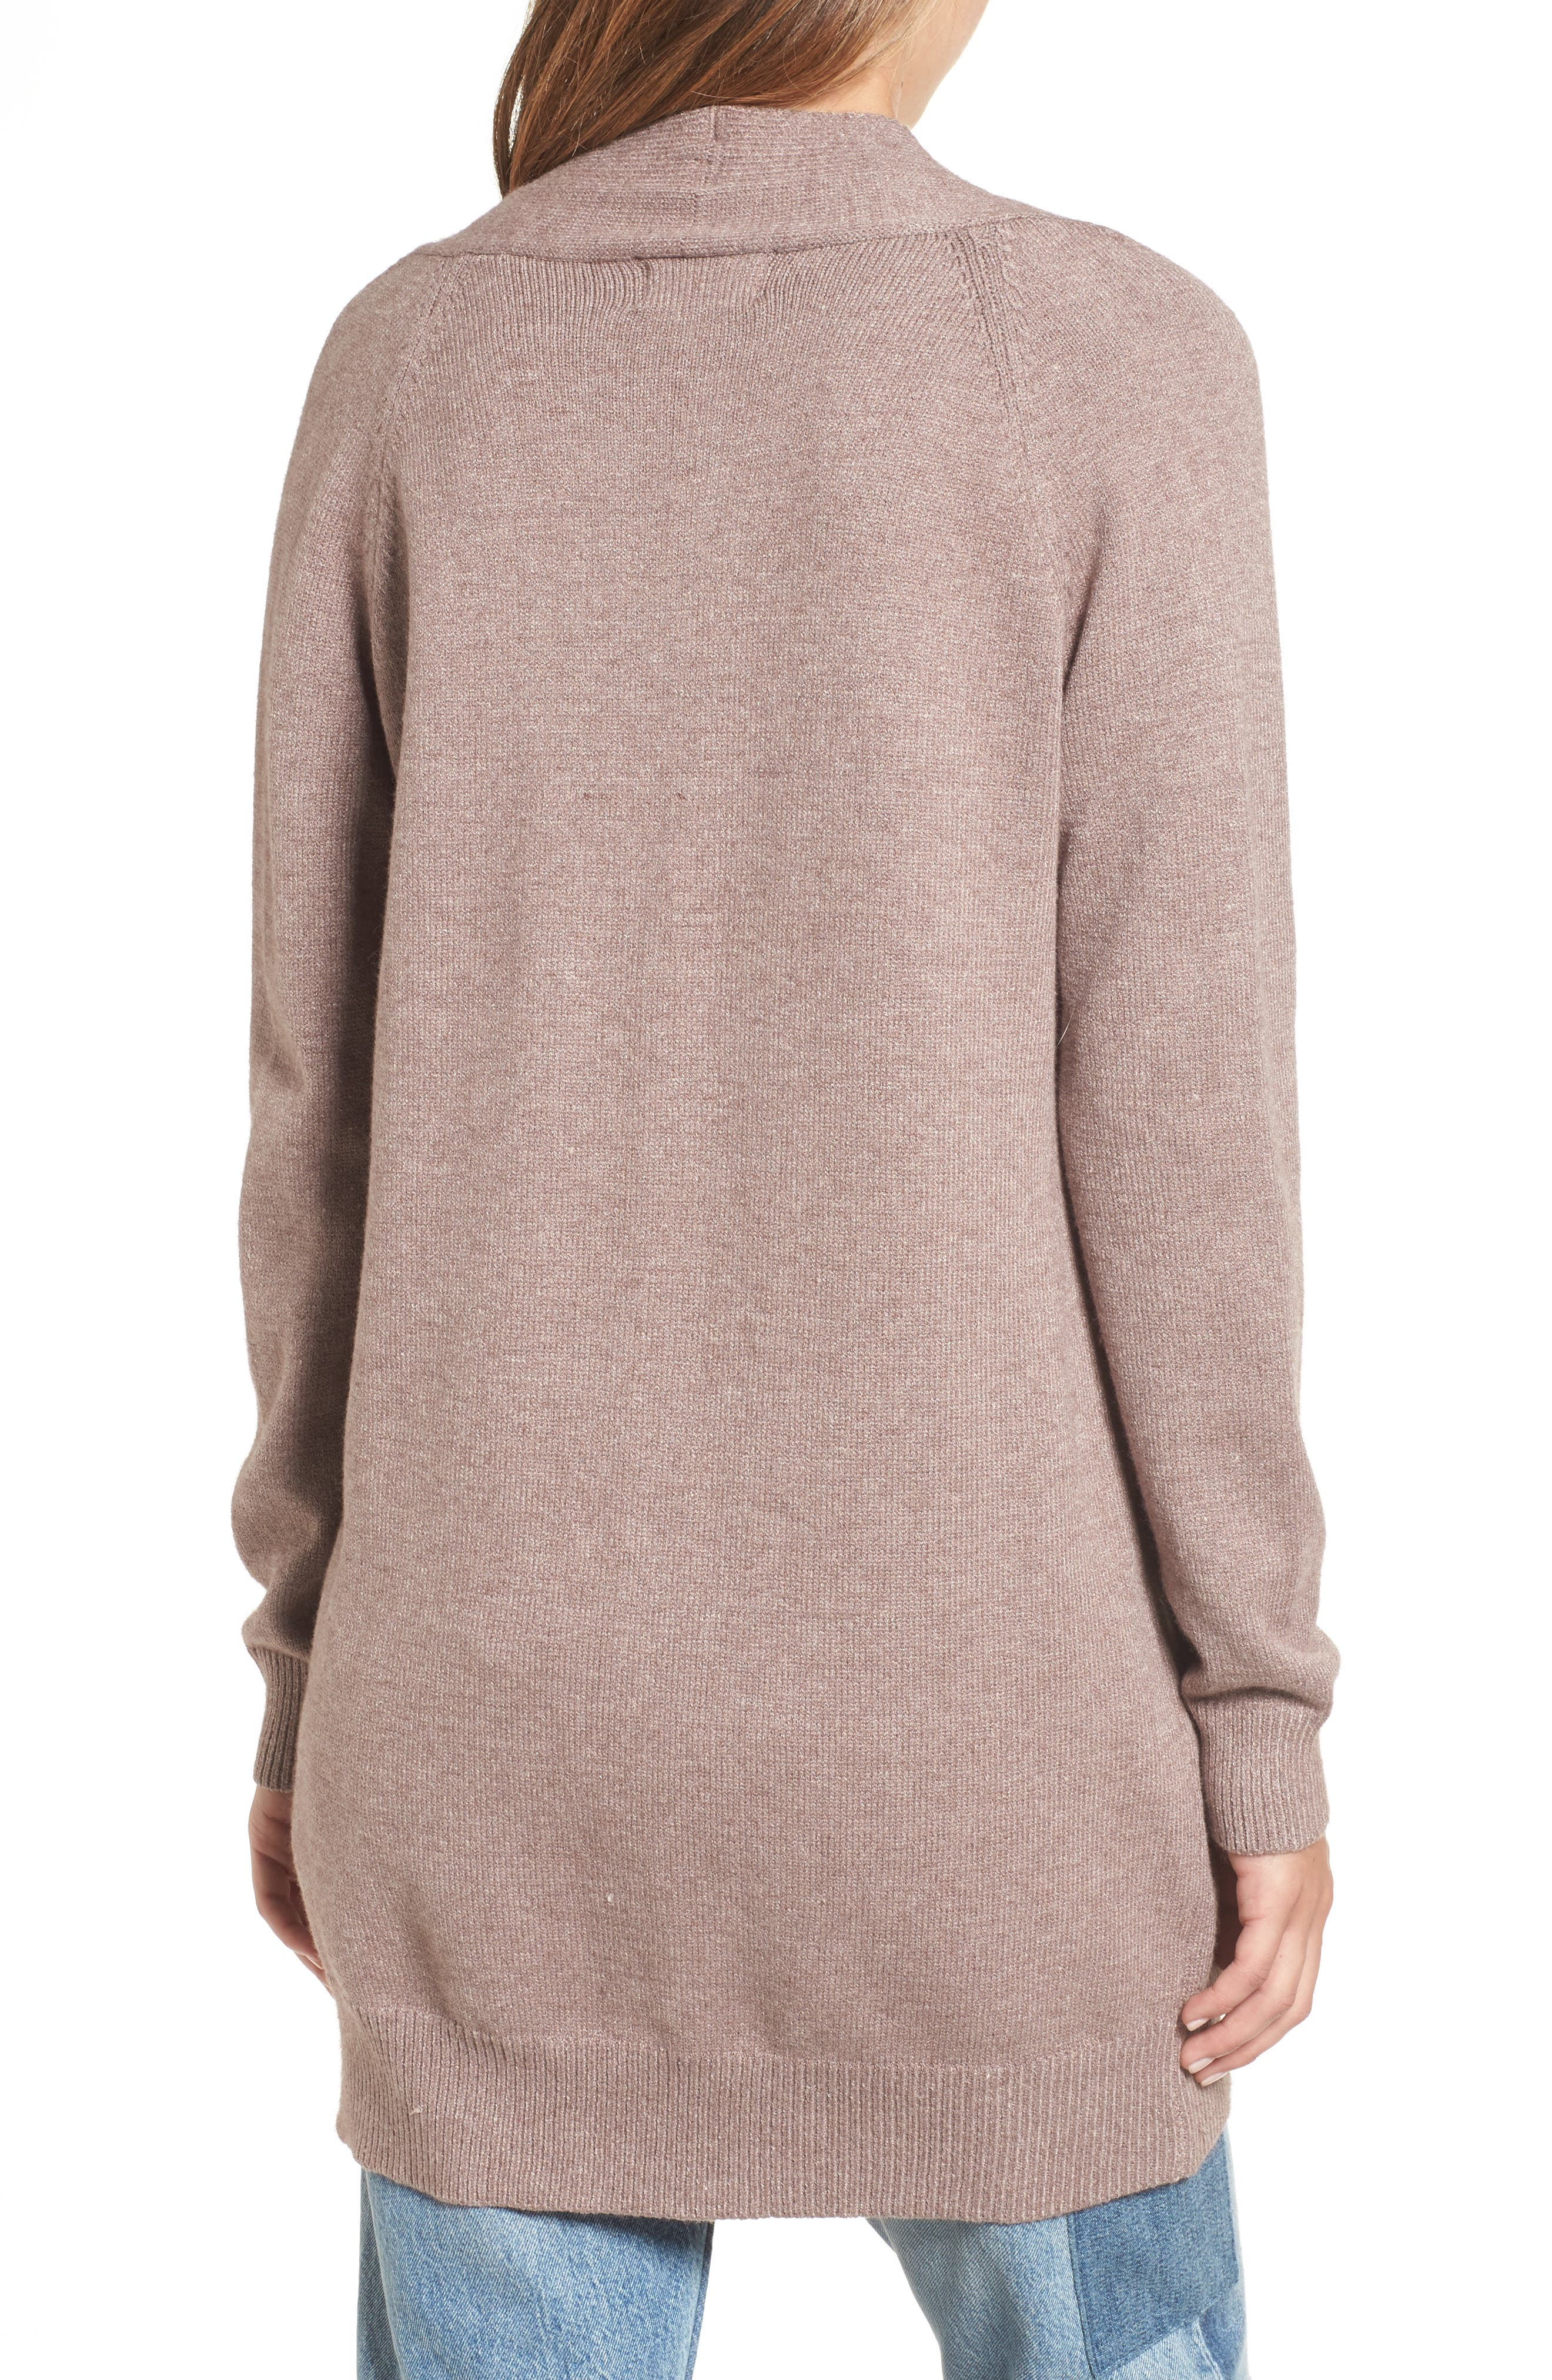 Women's Brown Cardigan Sweaters   Nordstrom